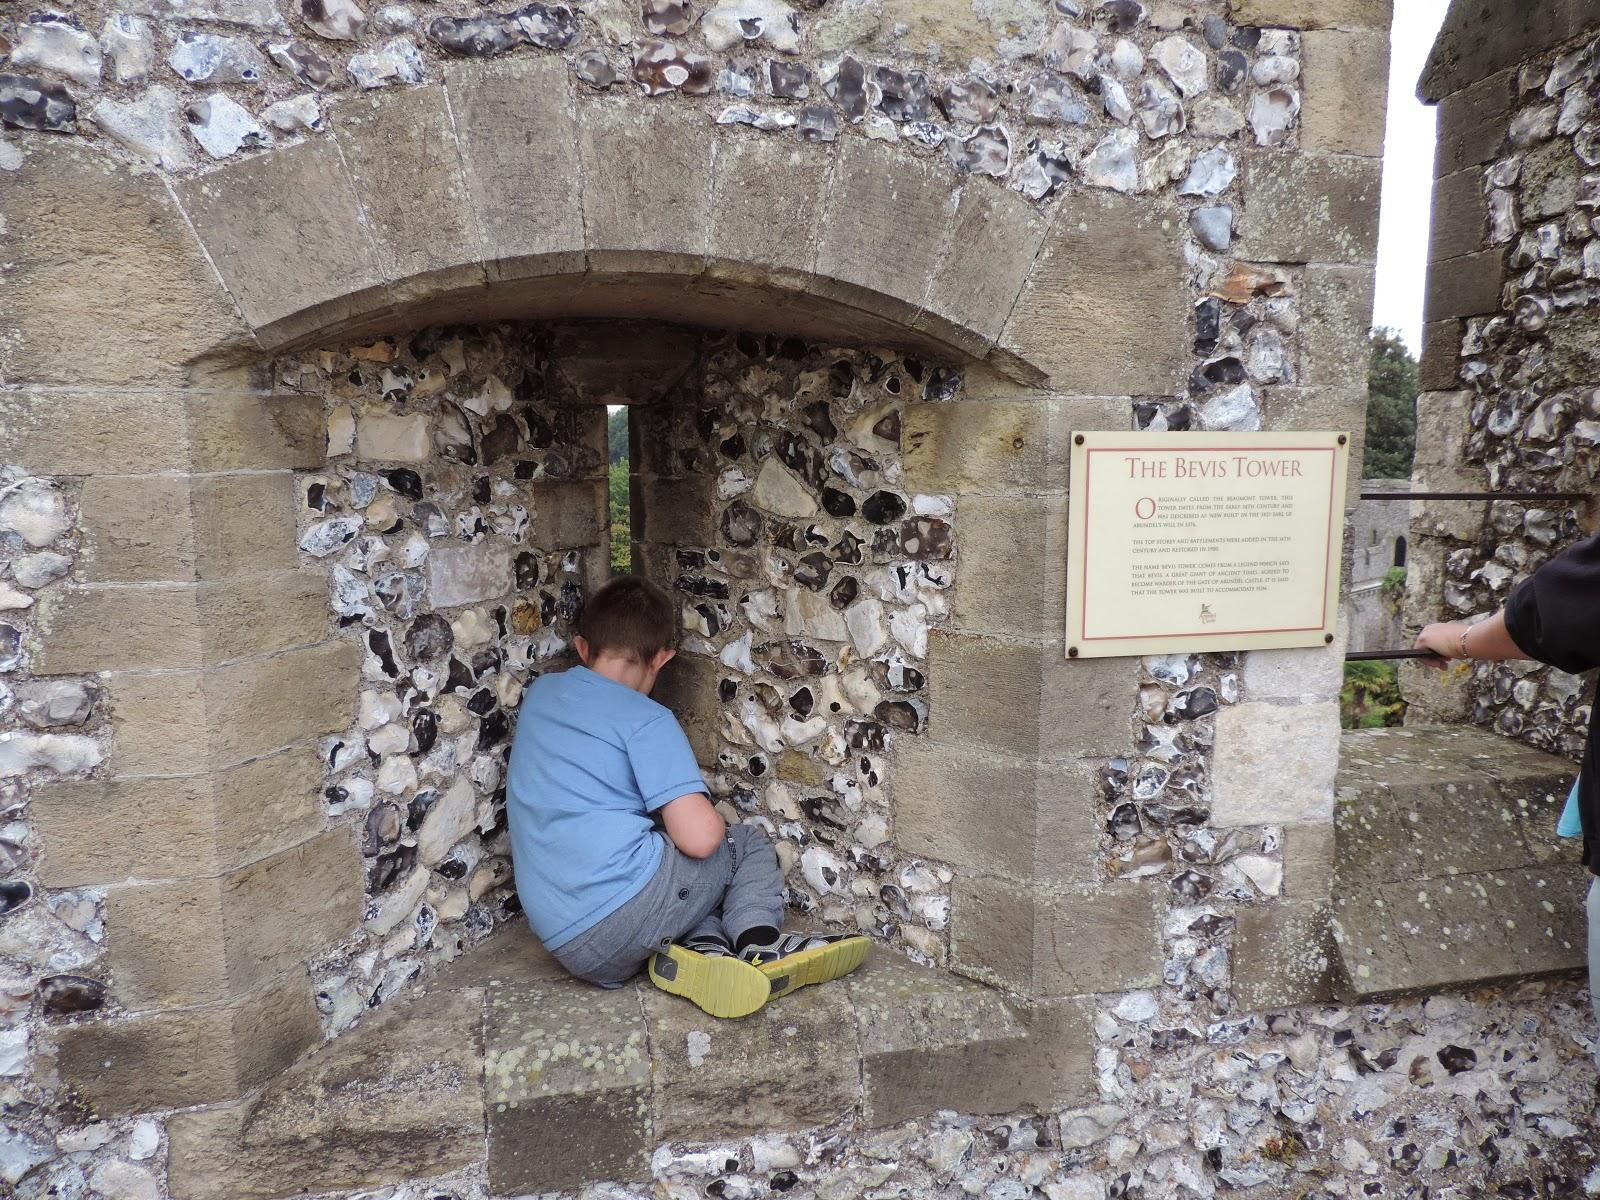 norman keep looking to bevis tower, arundel castle